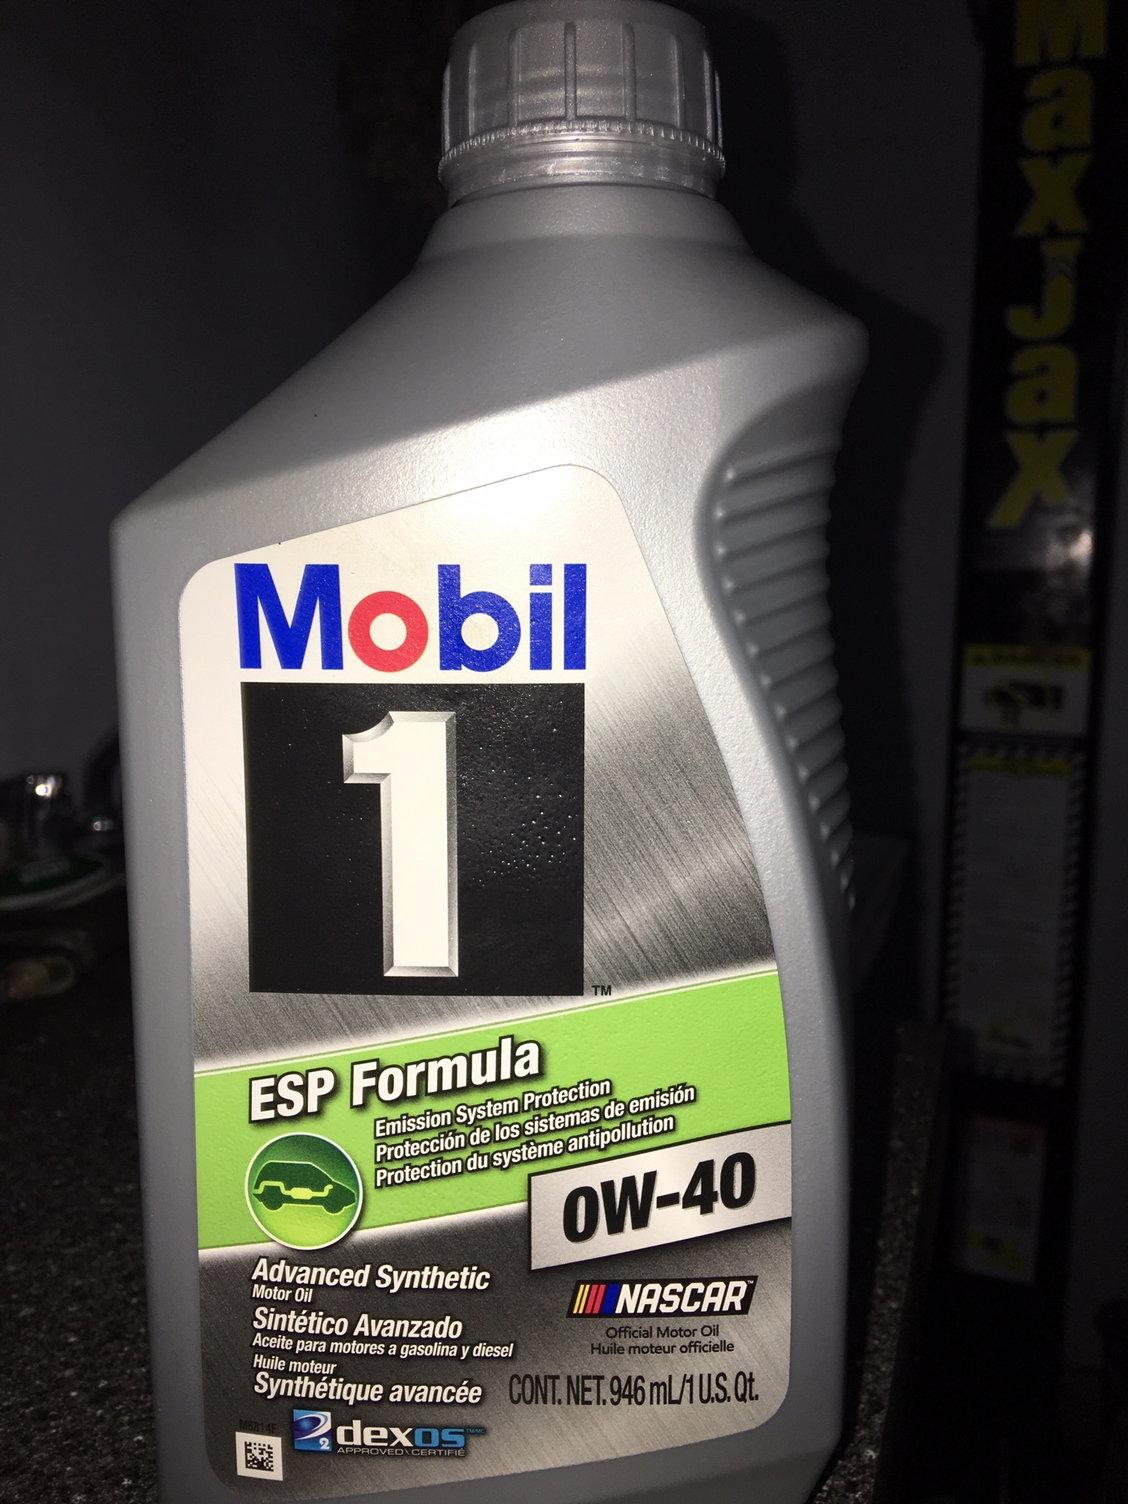 So what's the consensus on 0W40? - CorvetteForum - Chevrolet